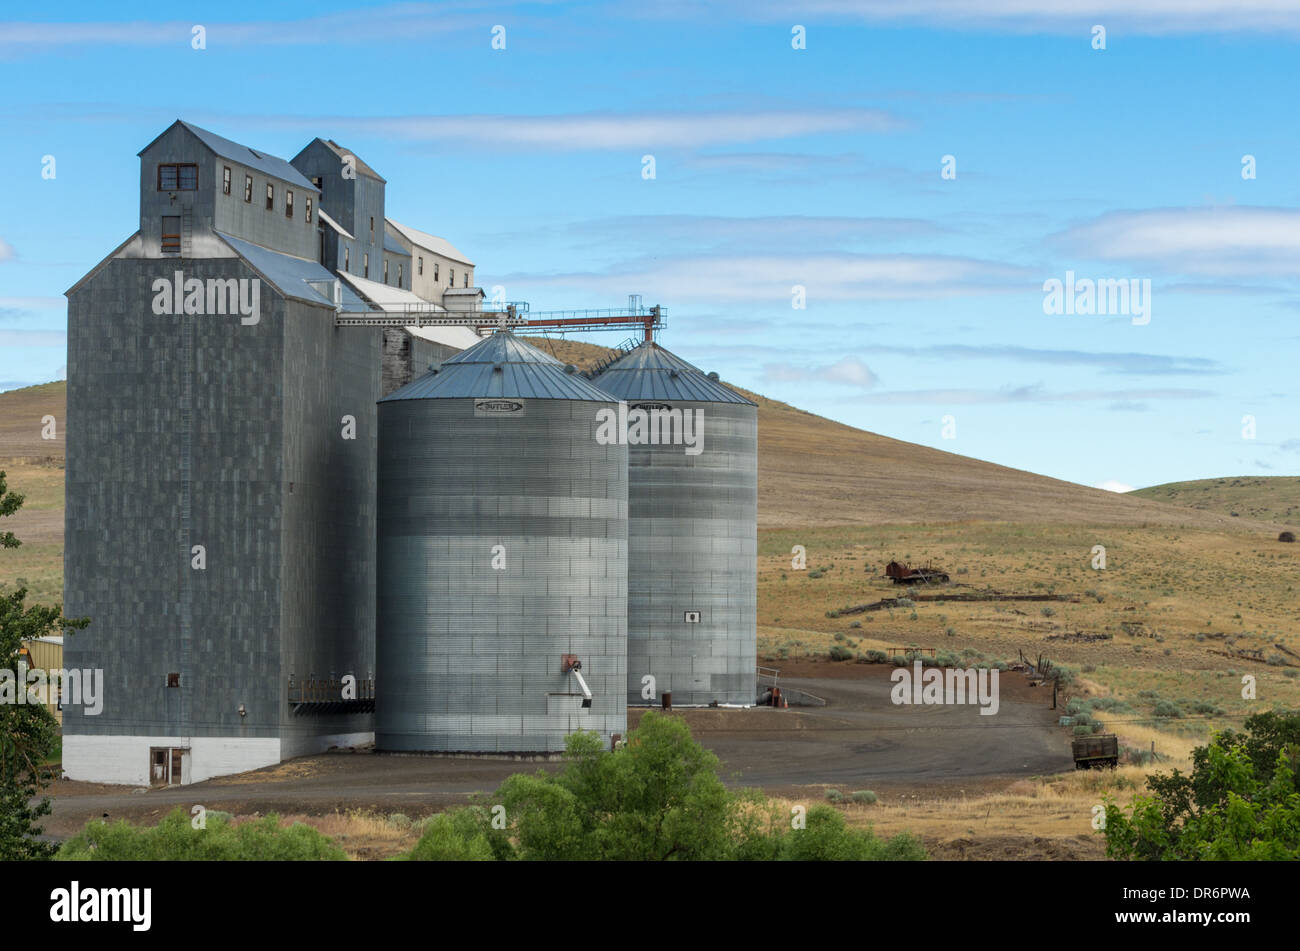 Grain storage silos and grain mill building. Dufur, Oregon, USA - Stock Image